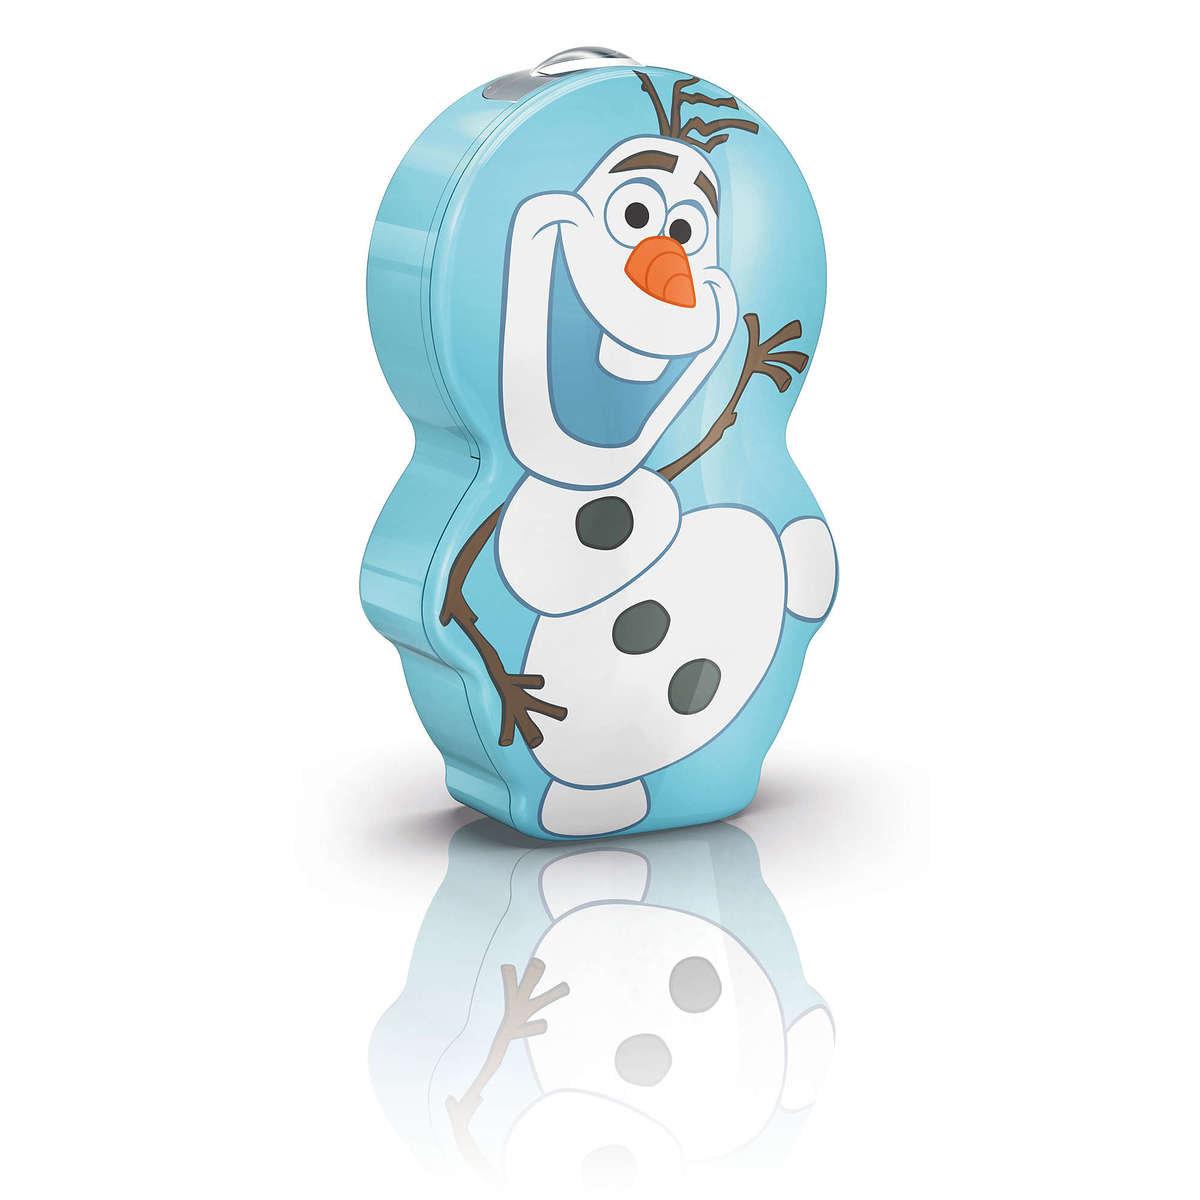 71767 Disney 冰雪奇緣 LED 手電筒